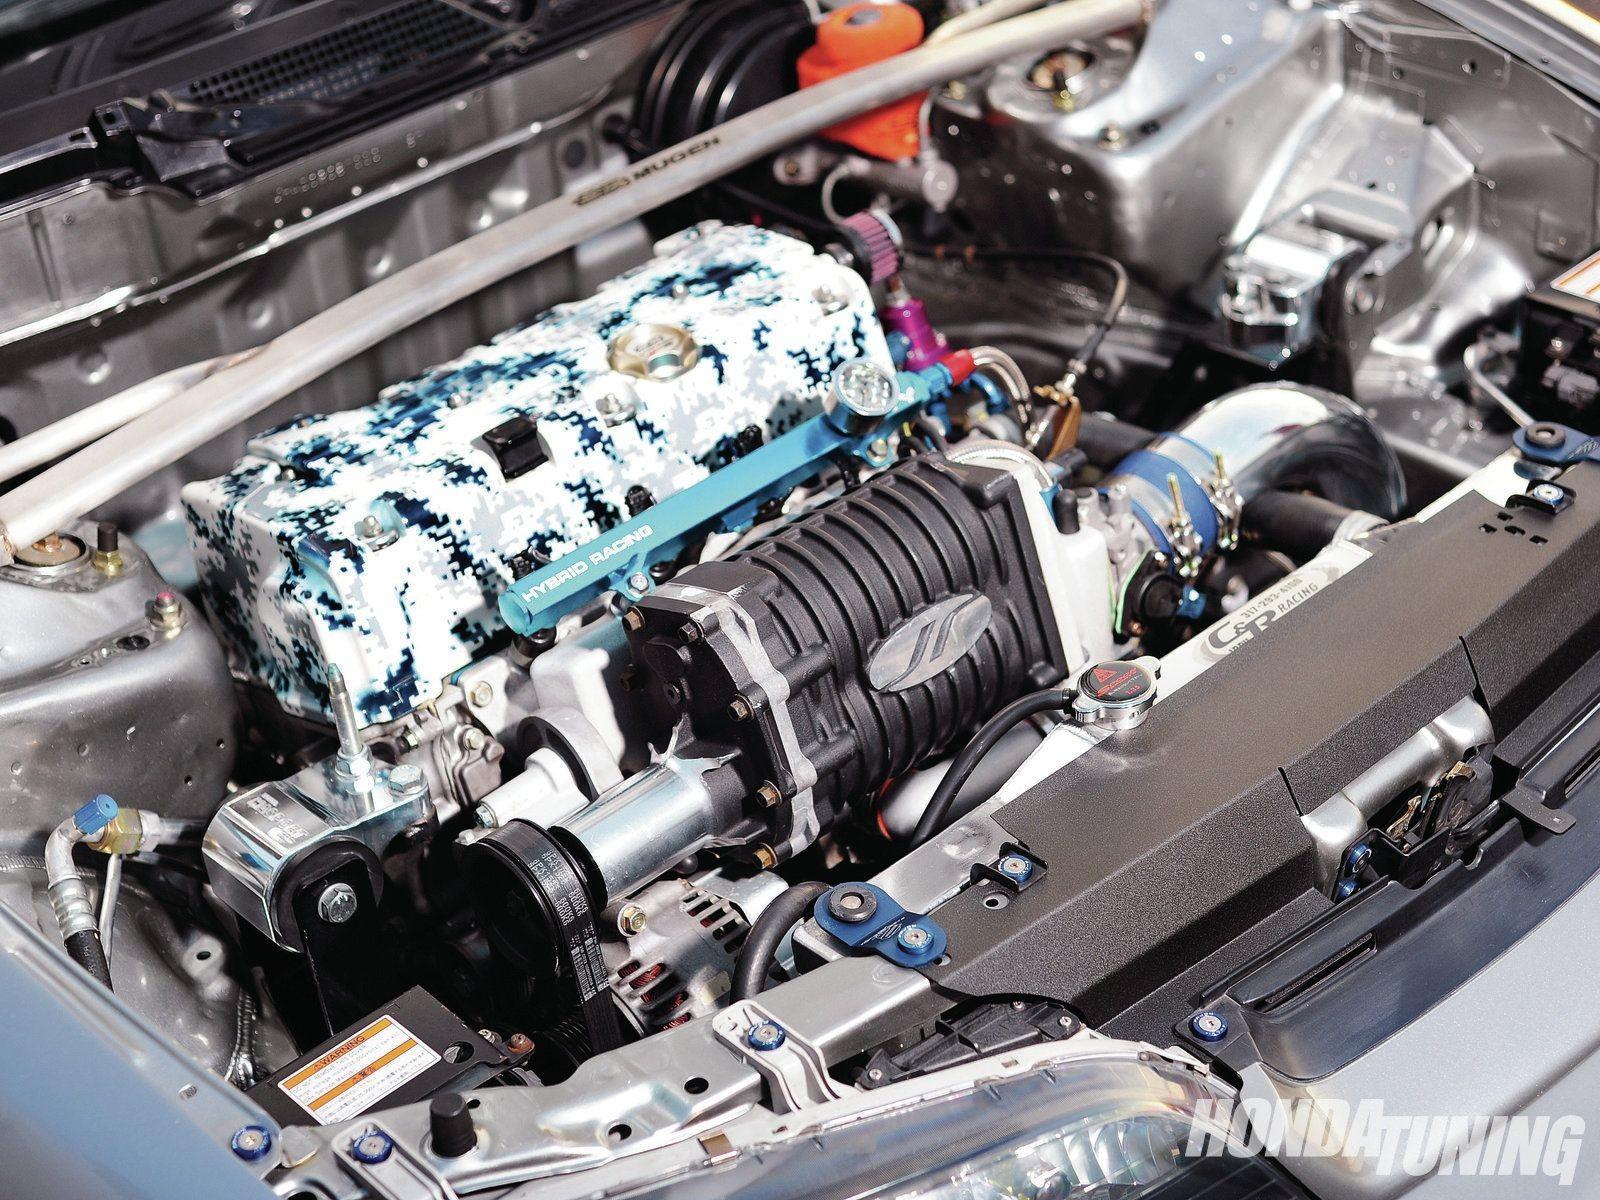 hight resolution of 1995 honda engine diagram circuit wiring and diagram hub u2022 1998 honda accord ex engine